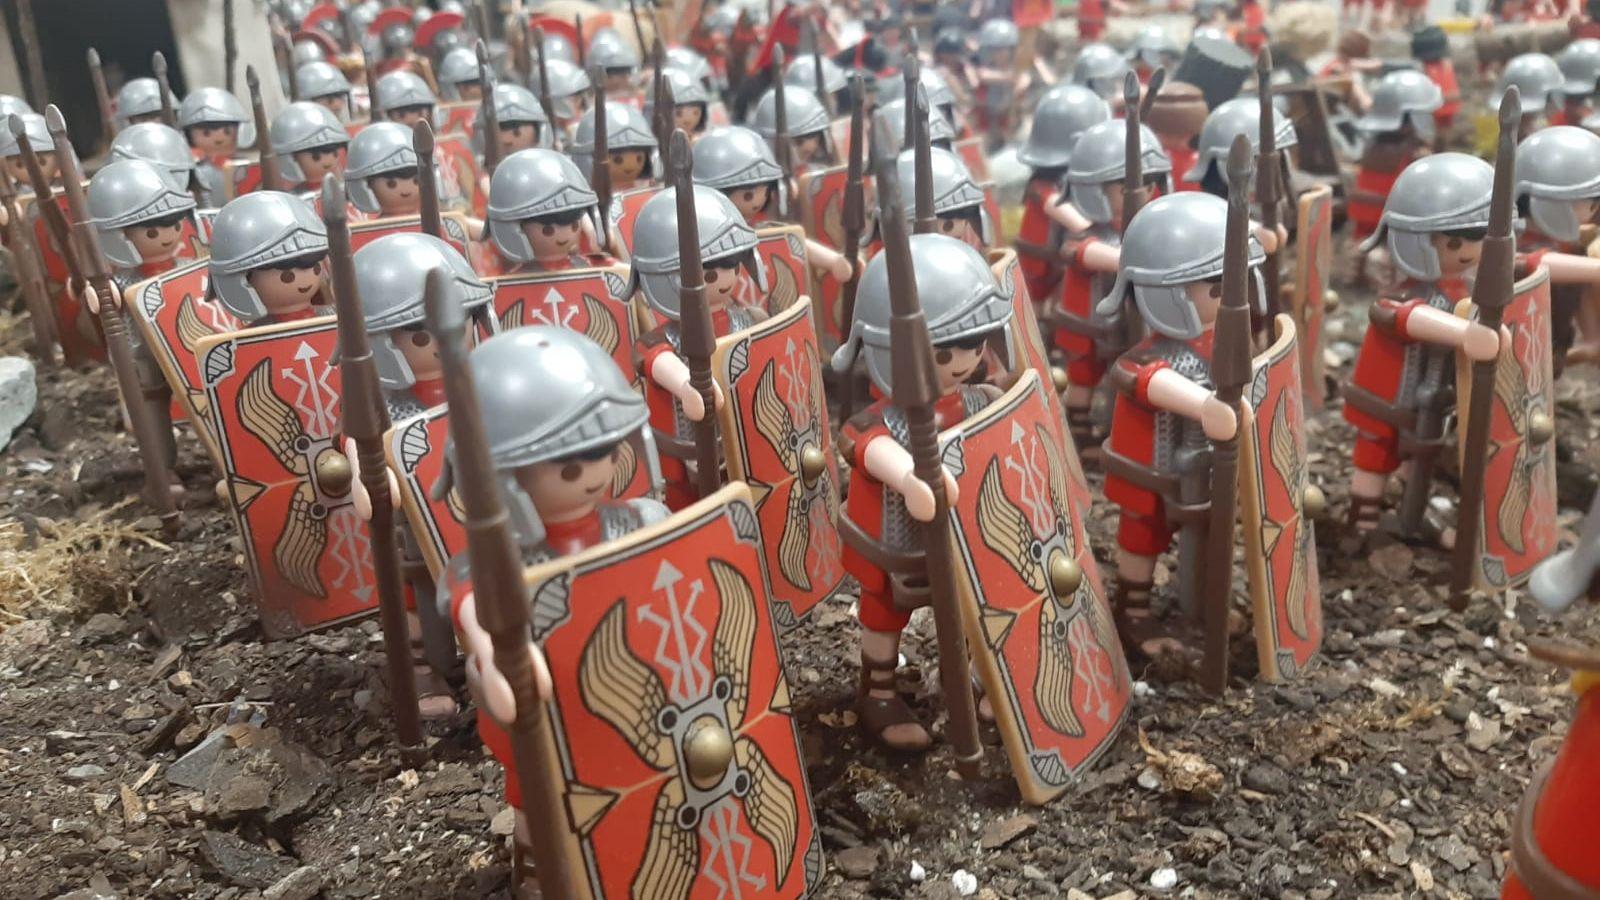 Exposición romana en Aller con playmobils.Punto de vacunación en el pabellón de Perchera-La Braña, en Gijón